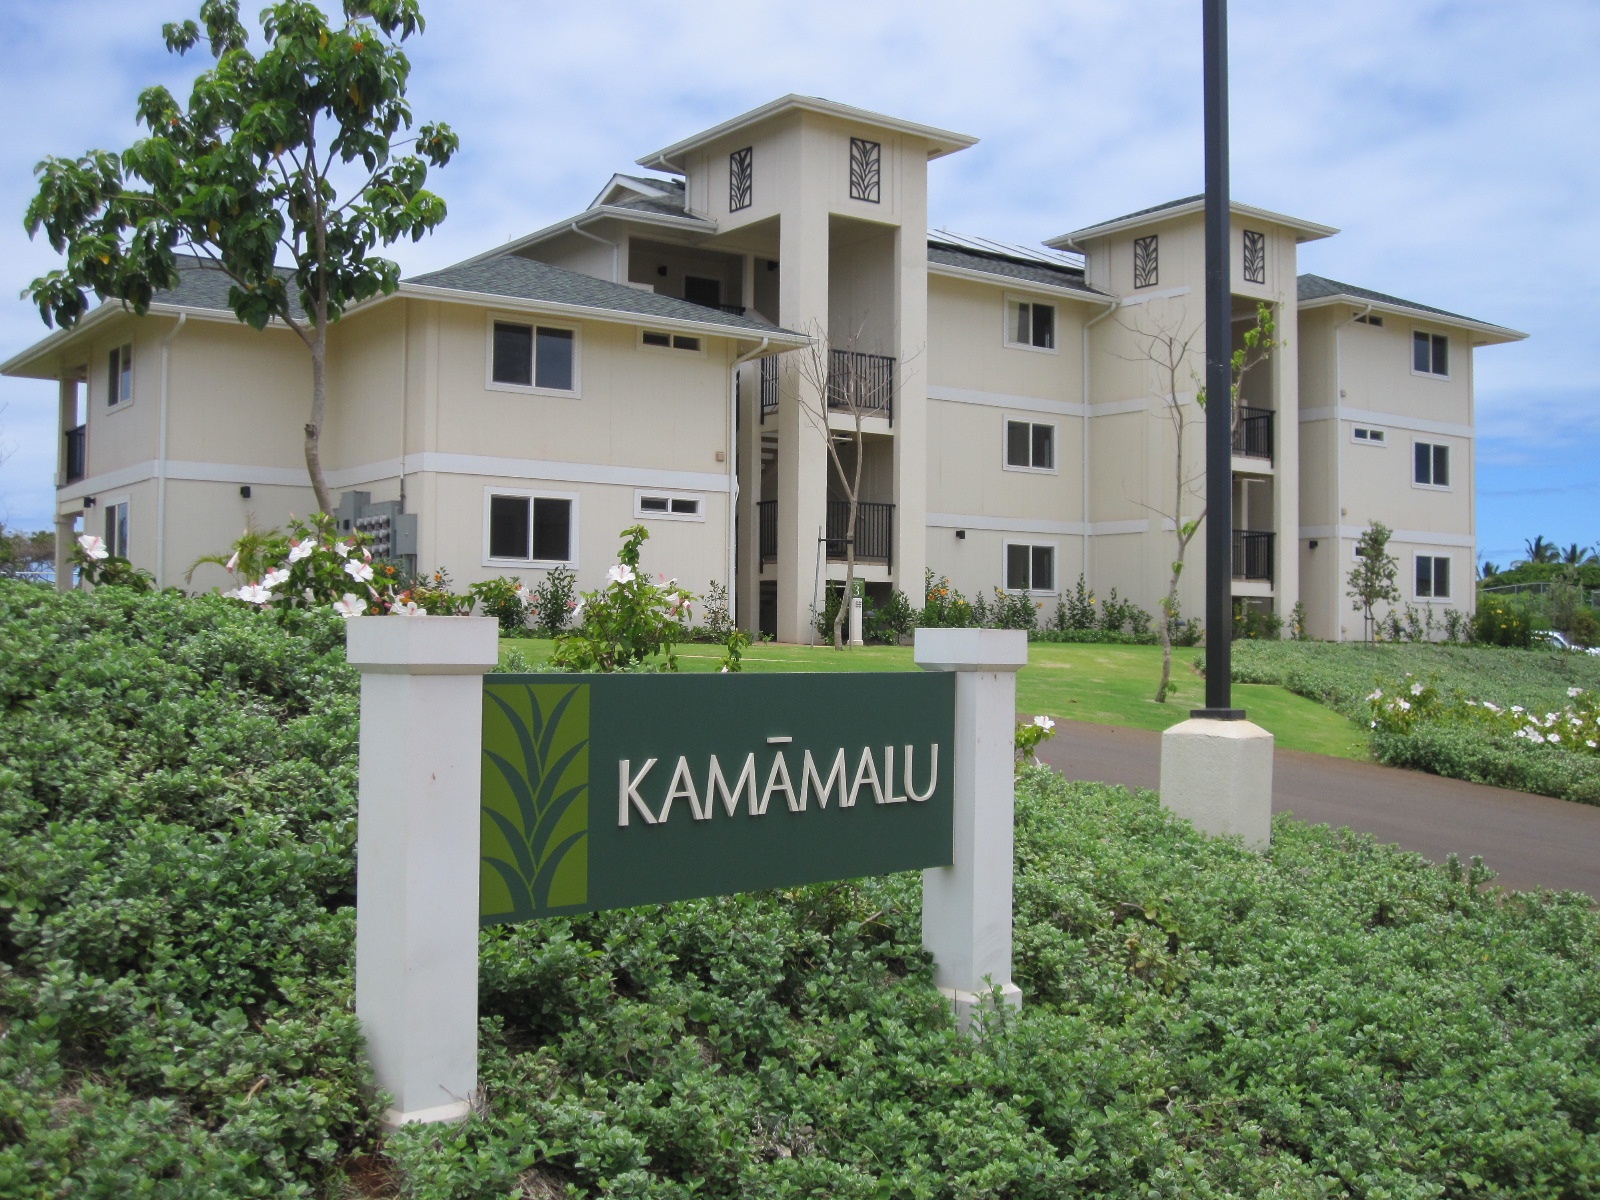 Kauai Lagoons Affordable Housing – Ph 1